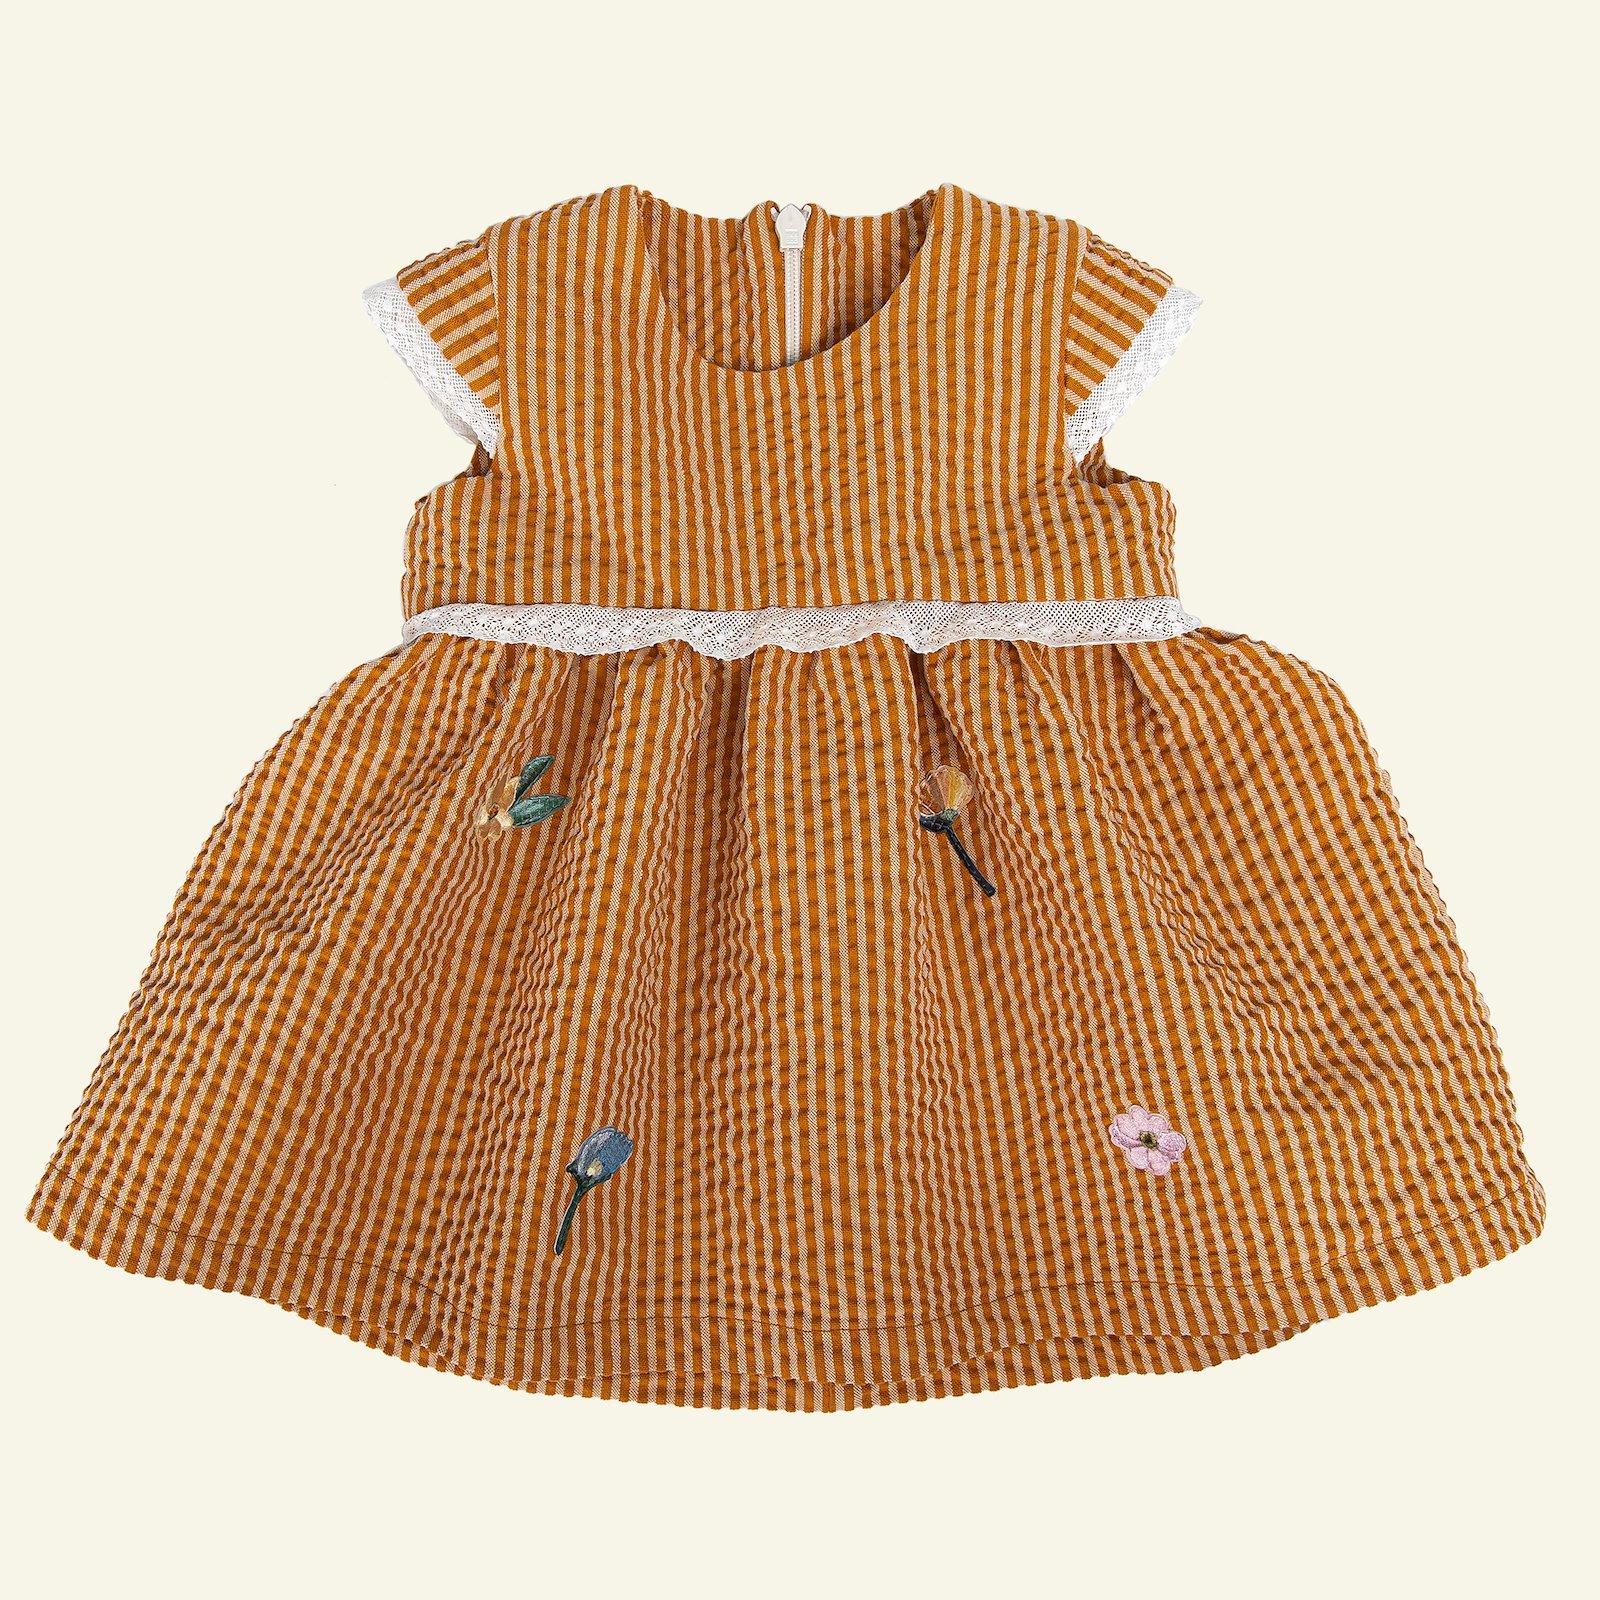 Dress, 68/6m p83014_510955_25130_26468_sskit